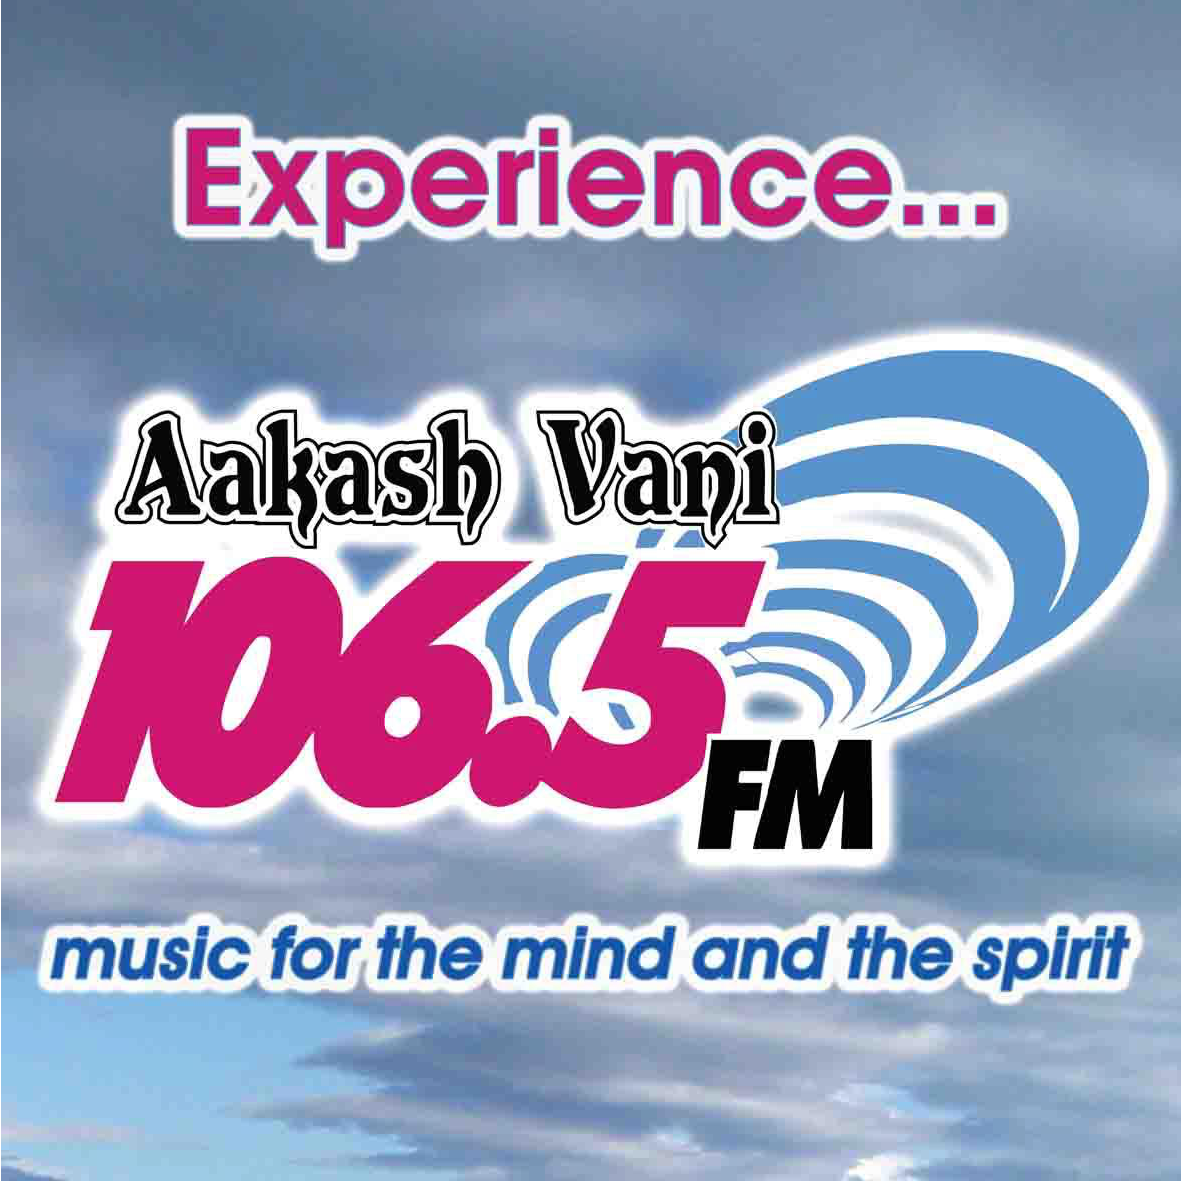 Aakashvani Radio